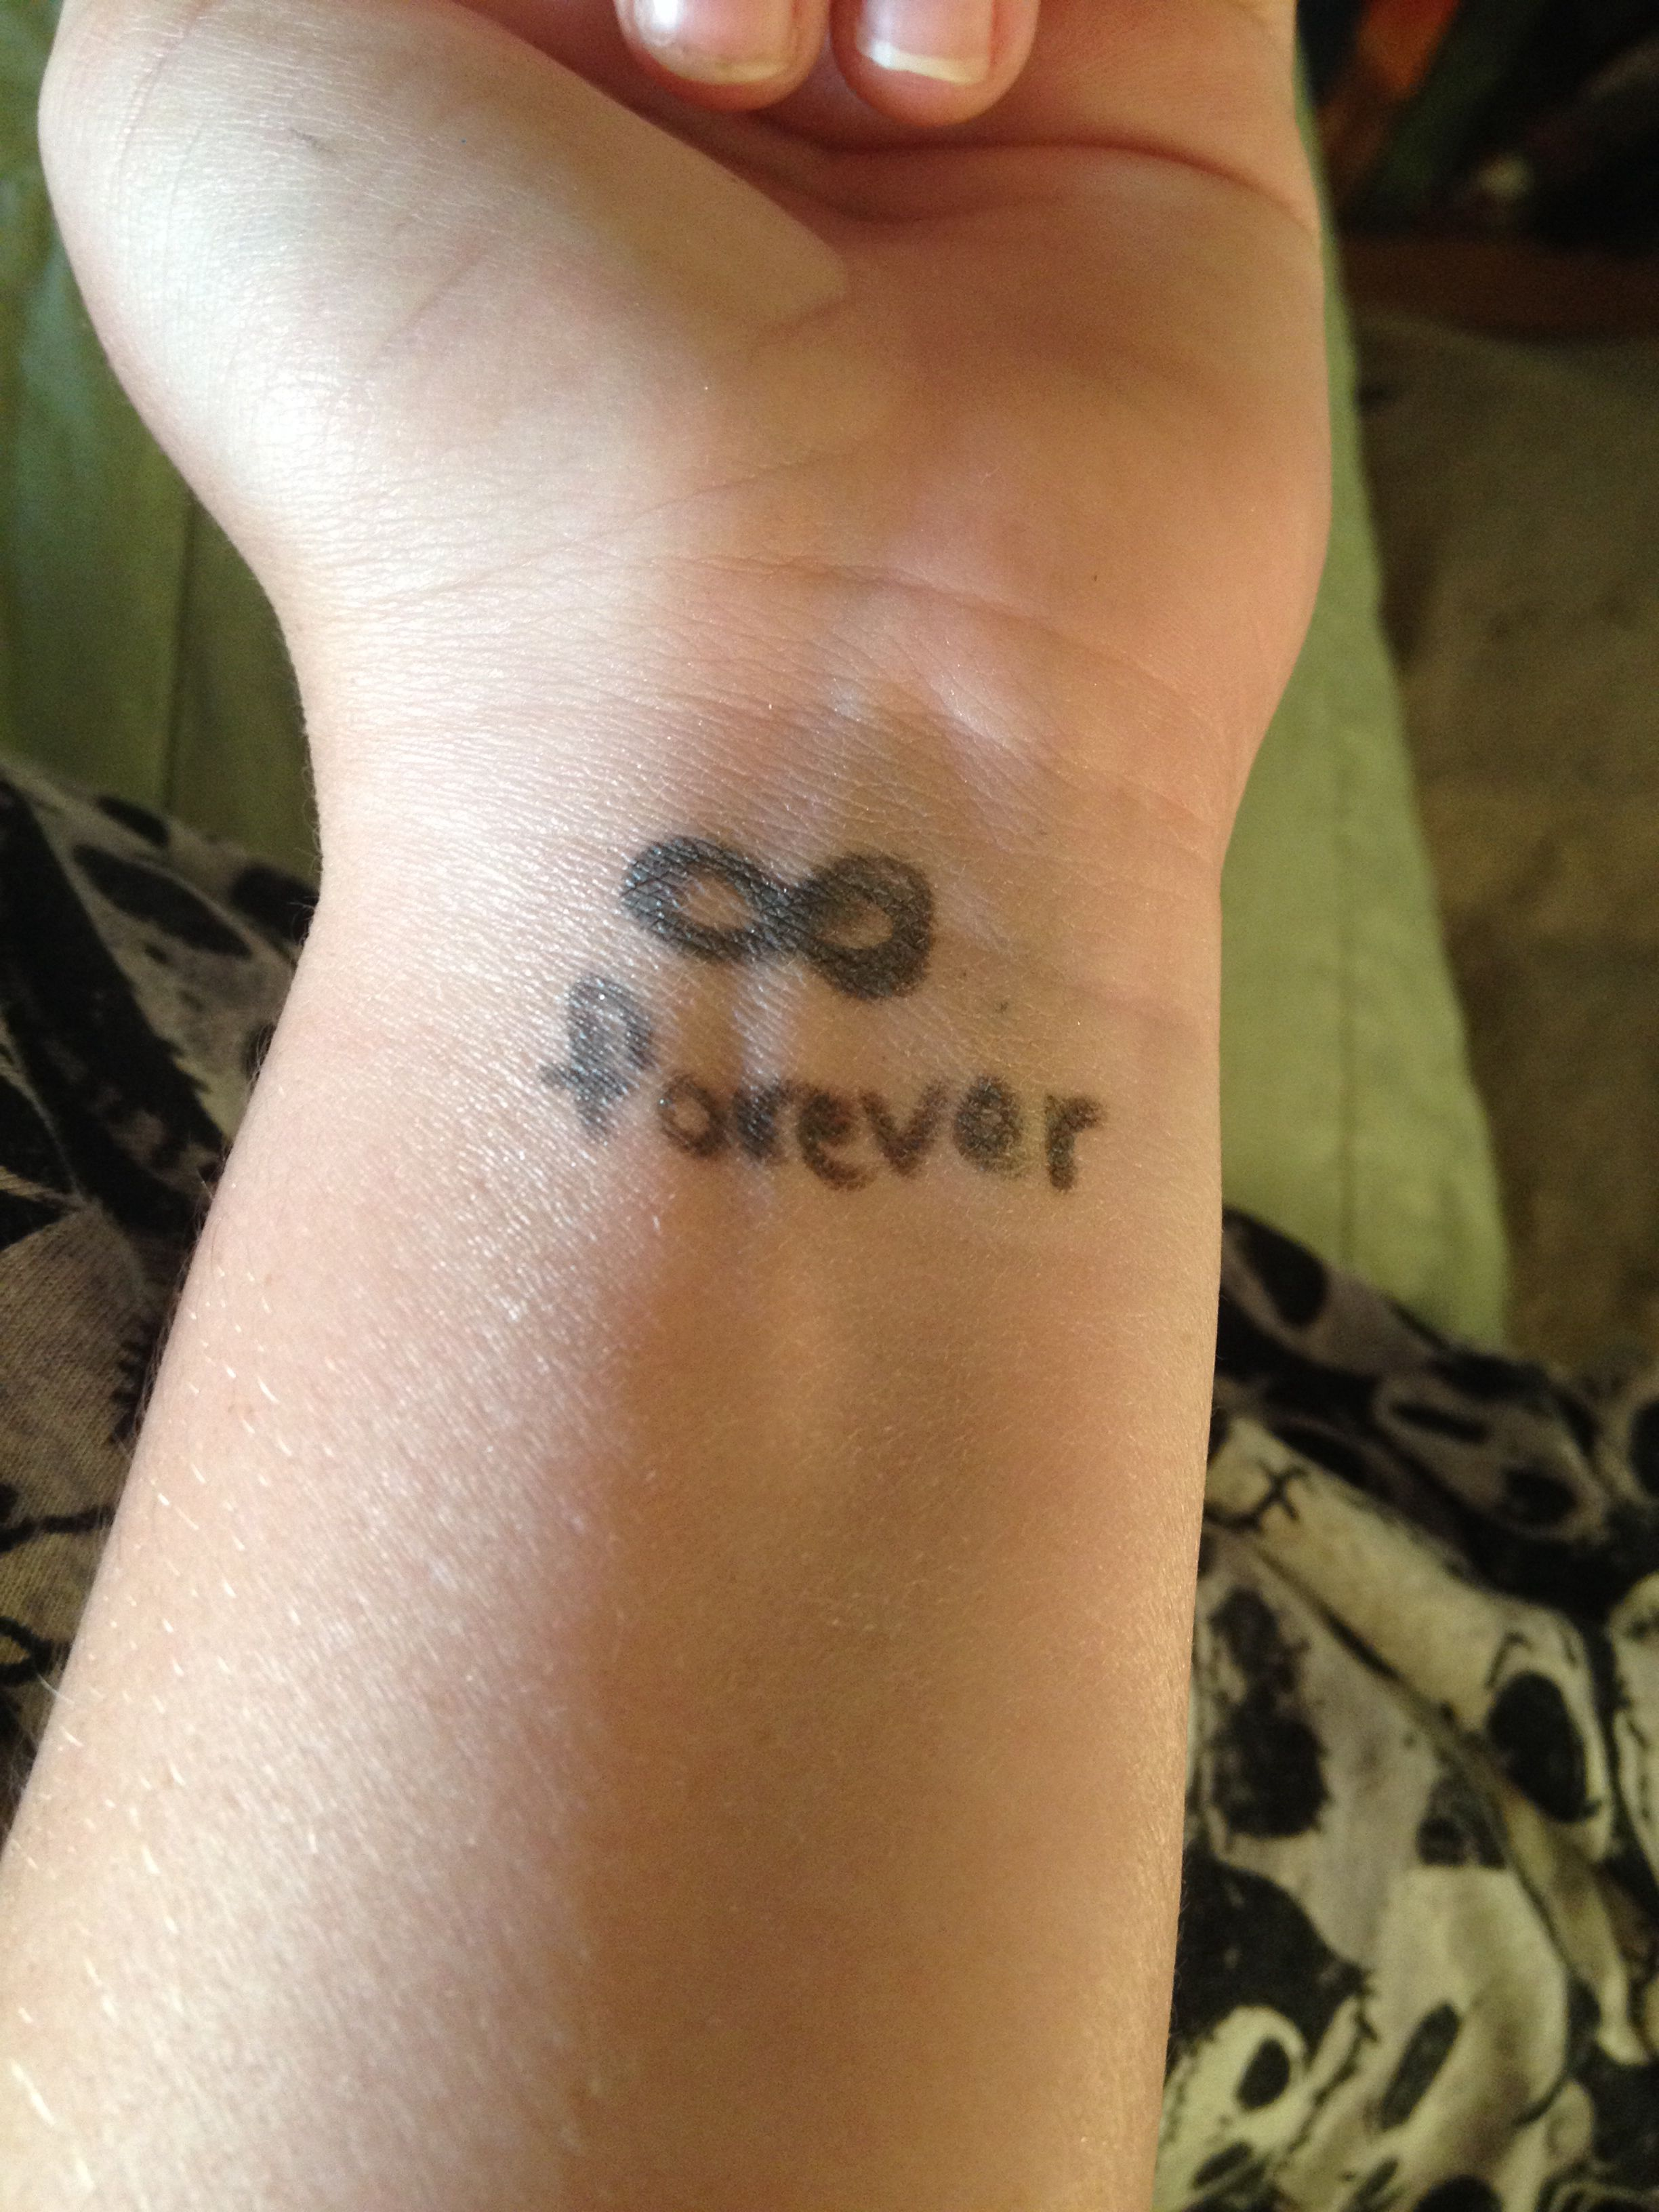 Temporary tattoos. Need hairspray Foundation powder